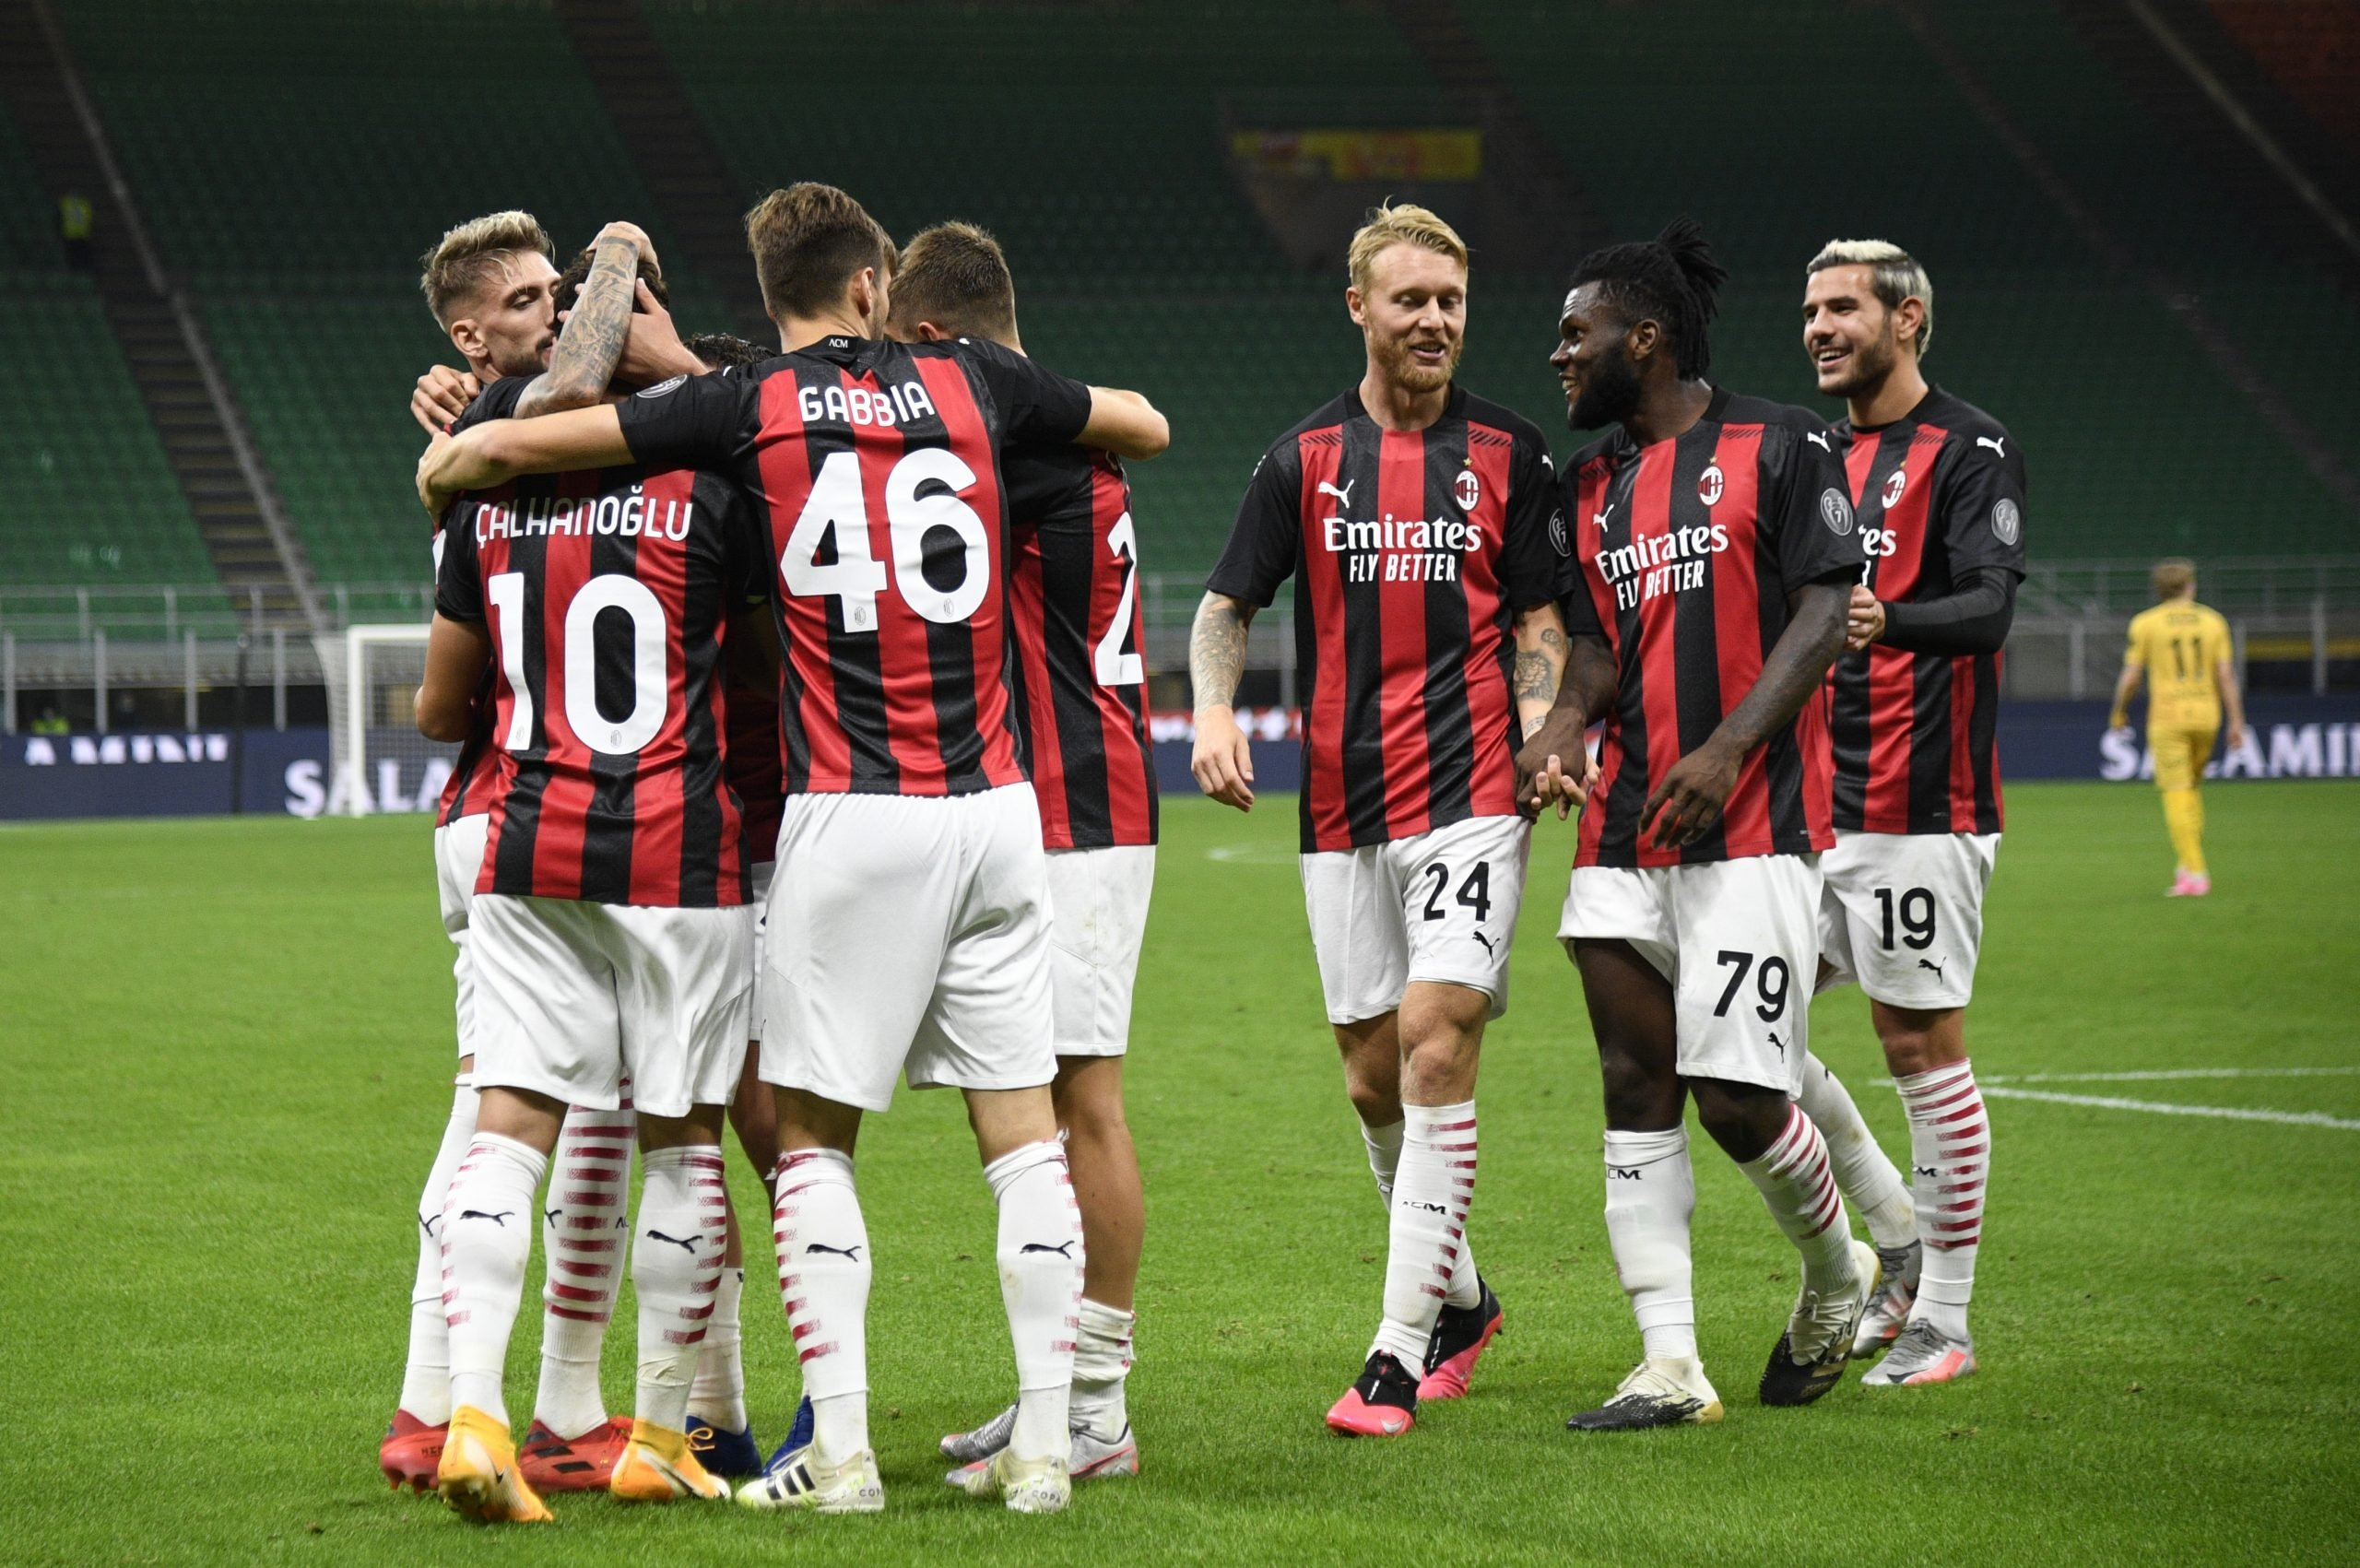 AC-Milan-Players-Salaries-2020-Weekly-Wage-scaled